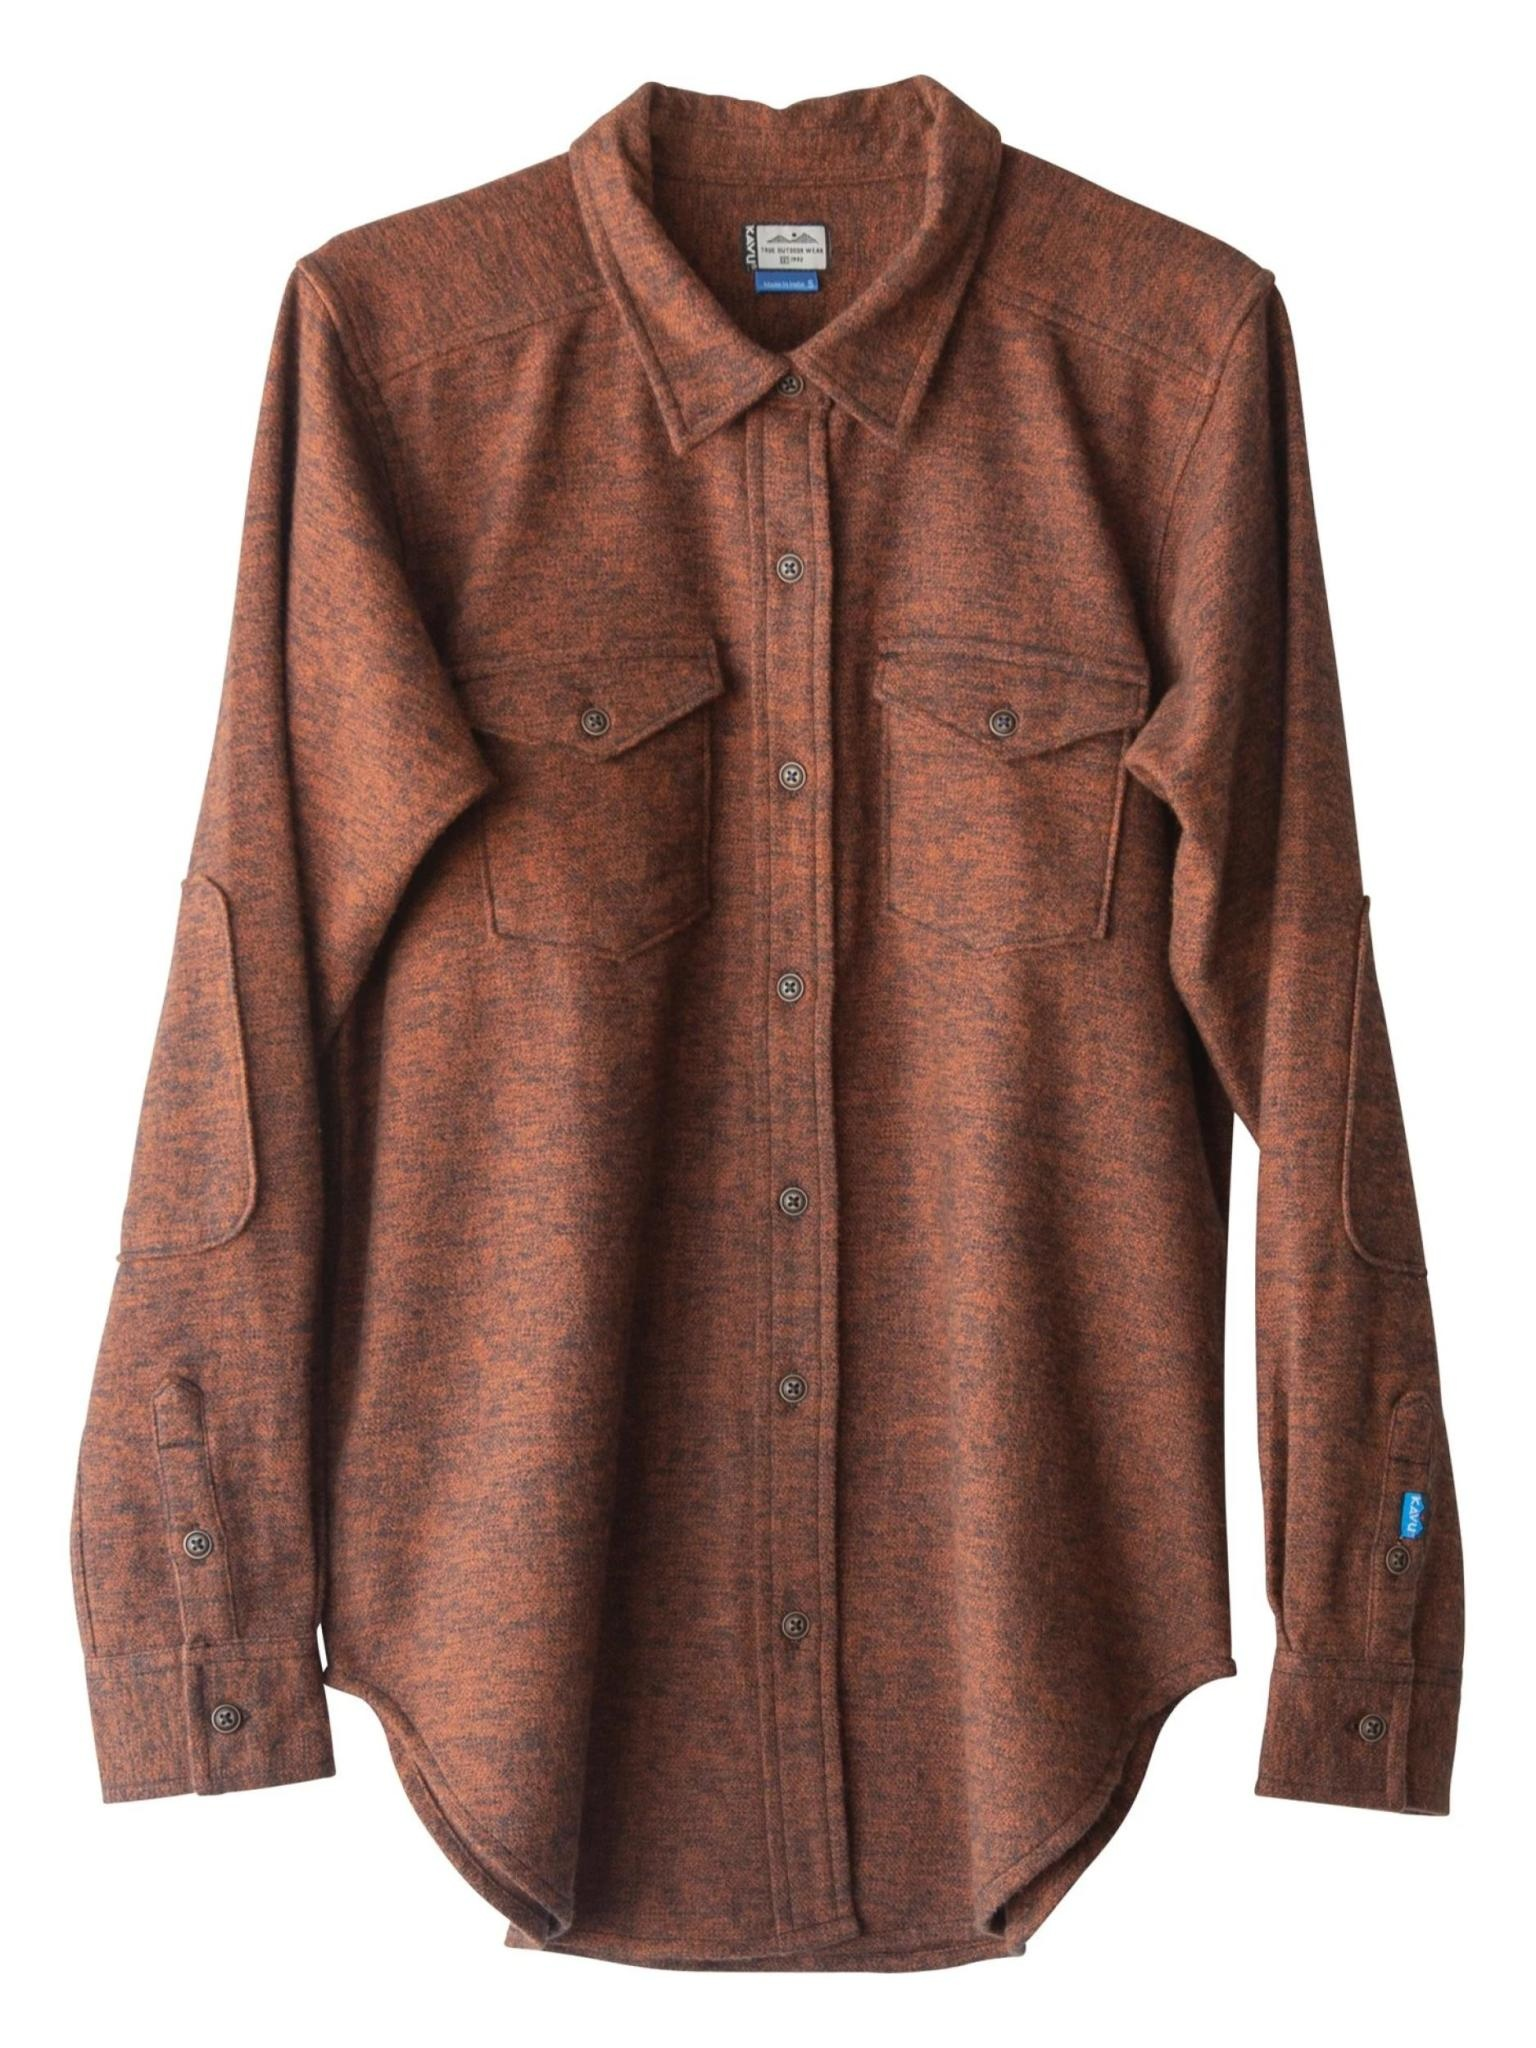 KAVU Women's Hadley Boyfriend Fit Cotton Flannel